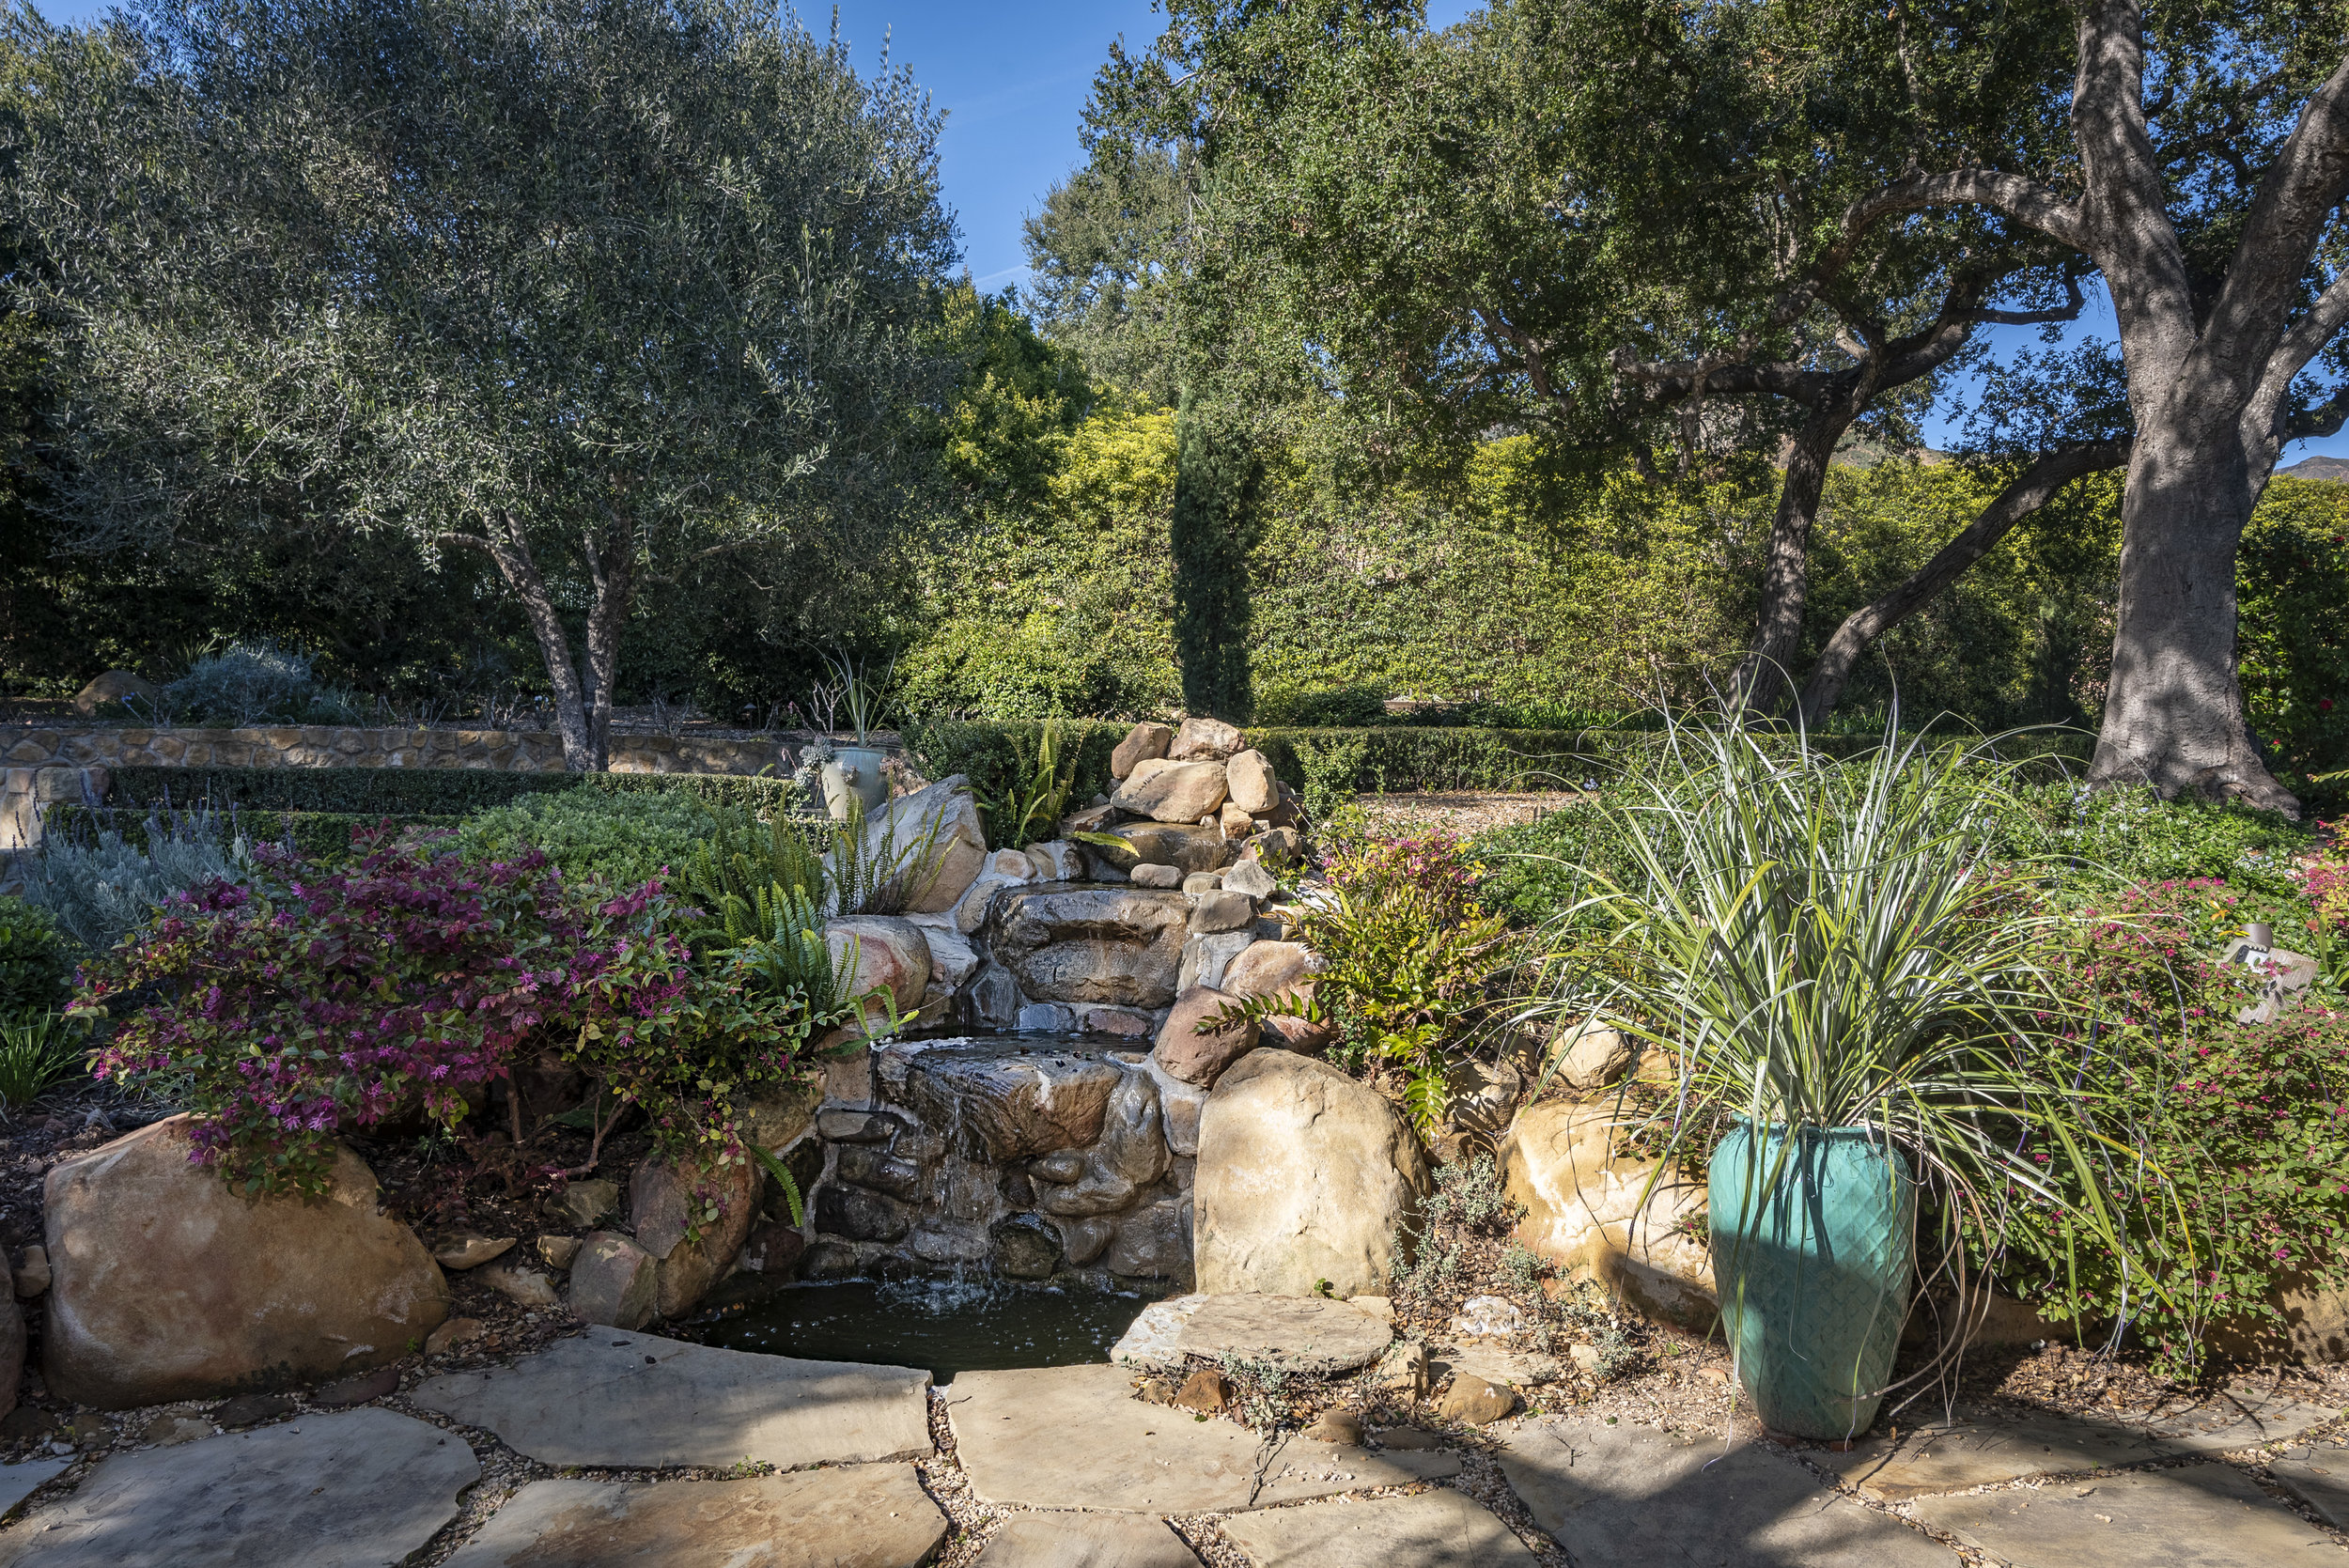 800 HS Rear Garden Fountain .jpg